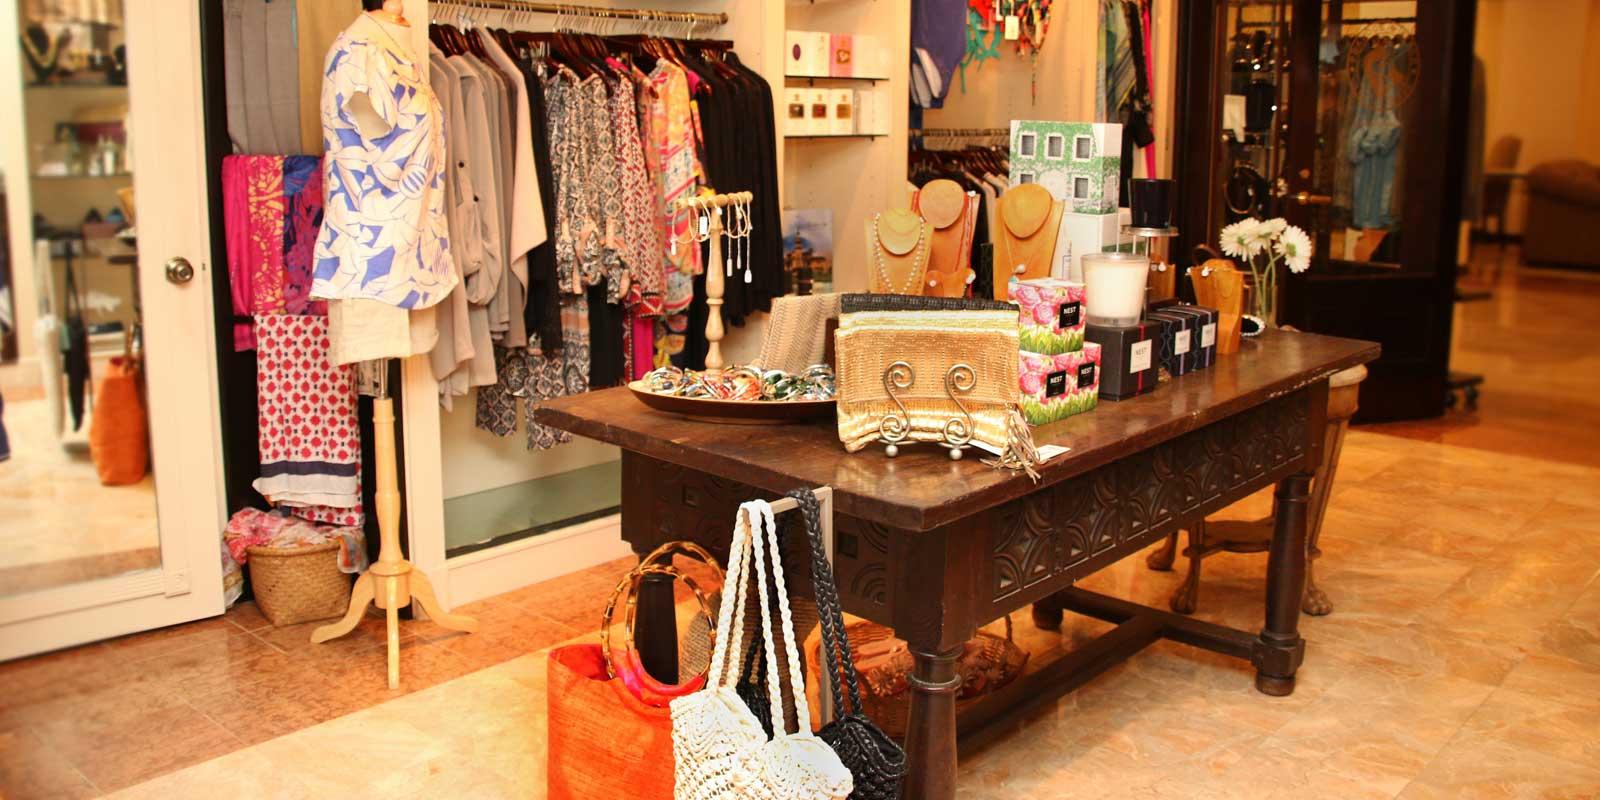 Retail shops at The Biltmore